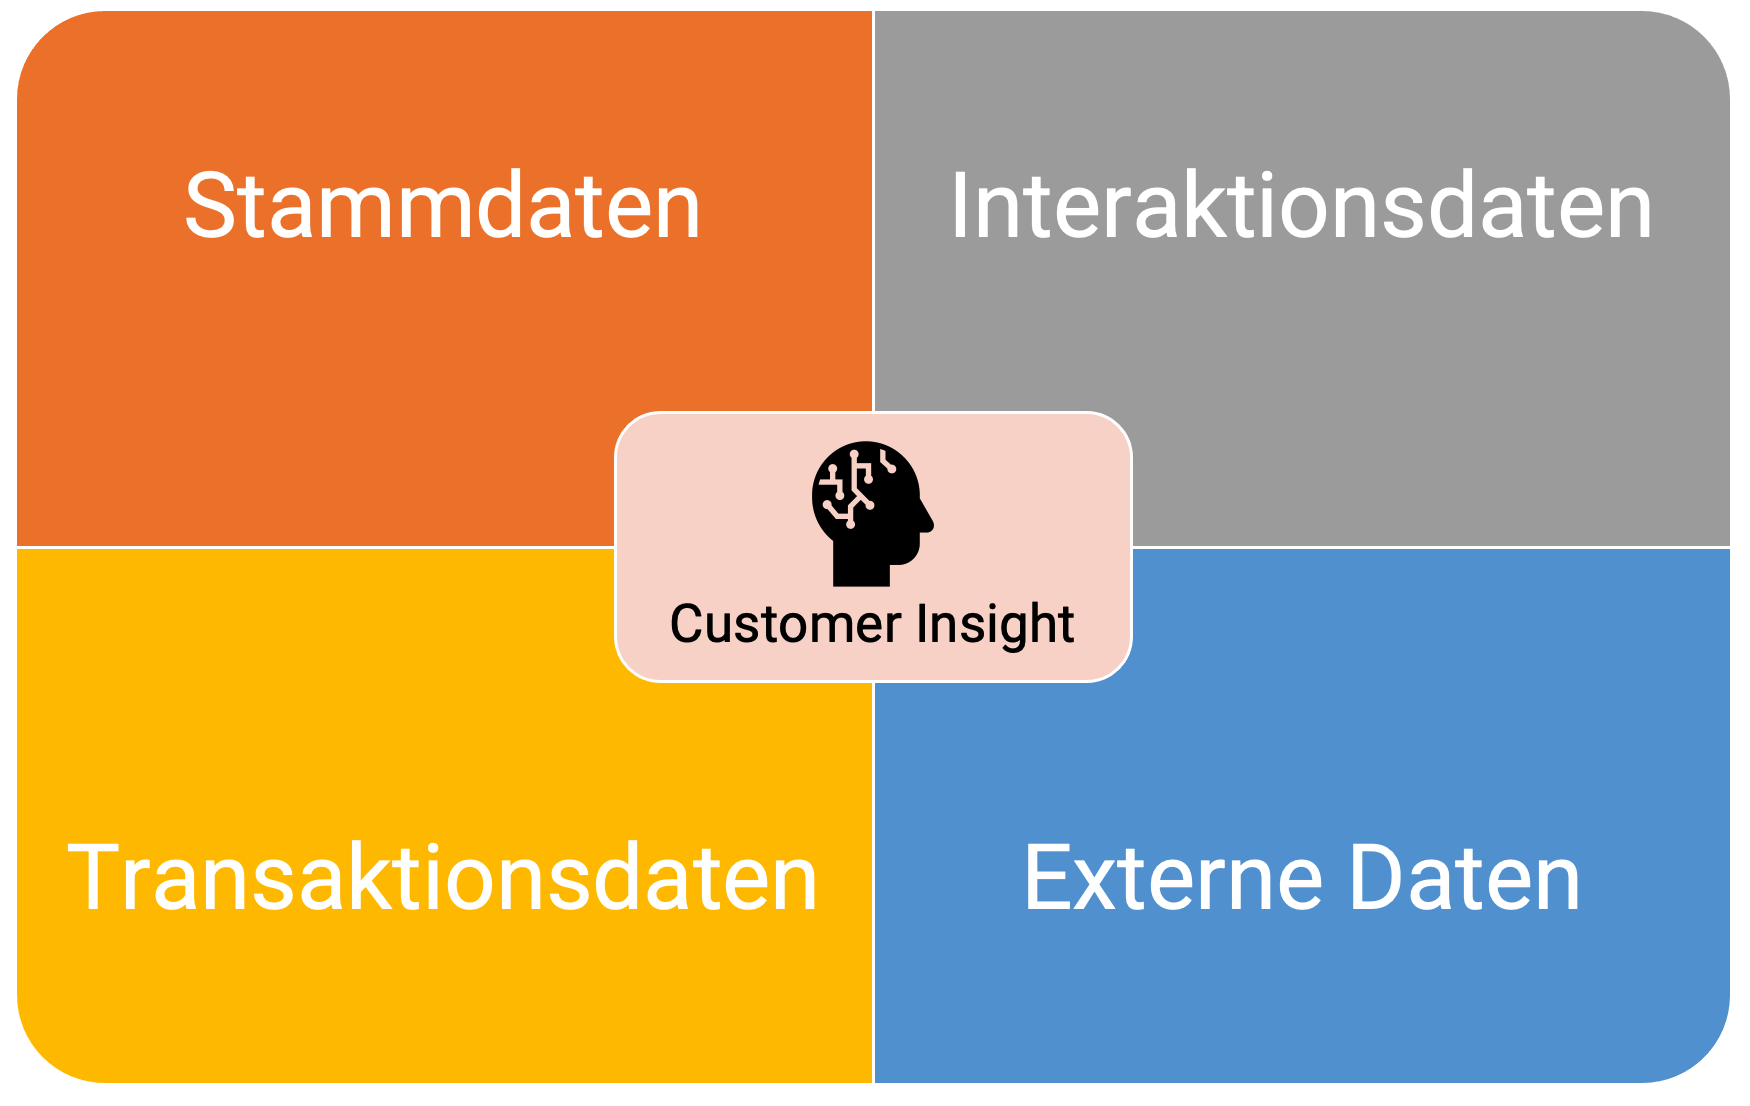 customer_insight_stammdaten_interaktionsdaten_transaktionsaten_externe-daten